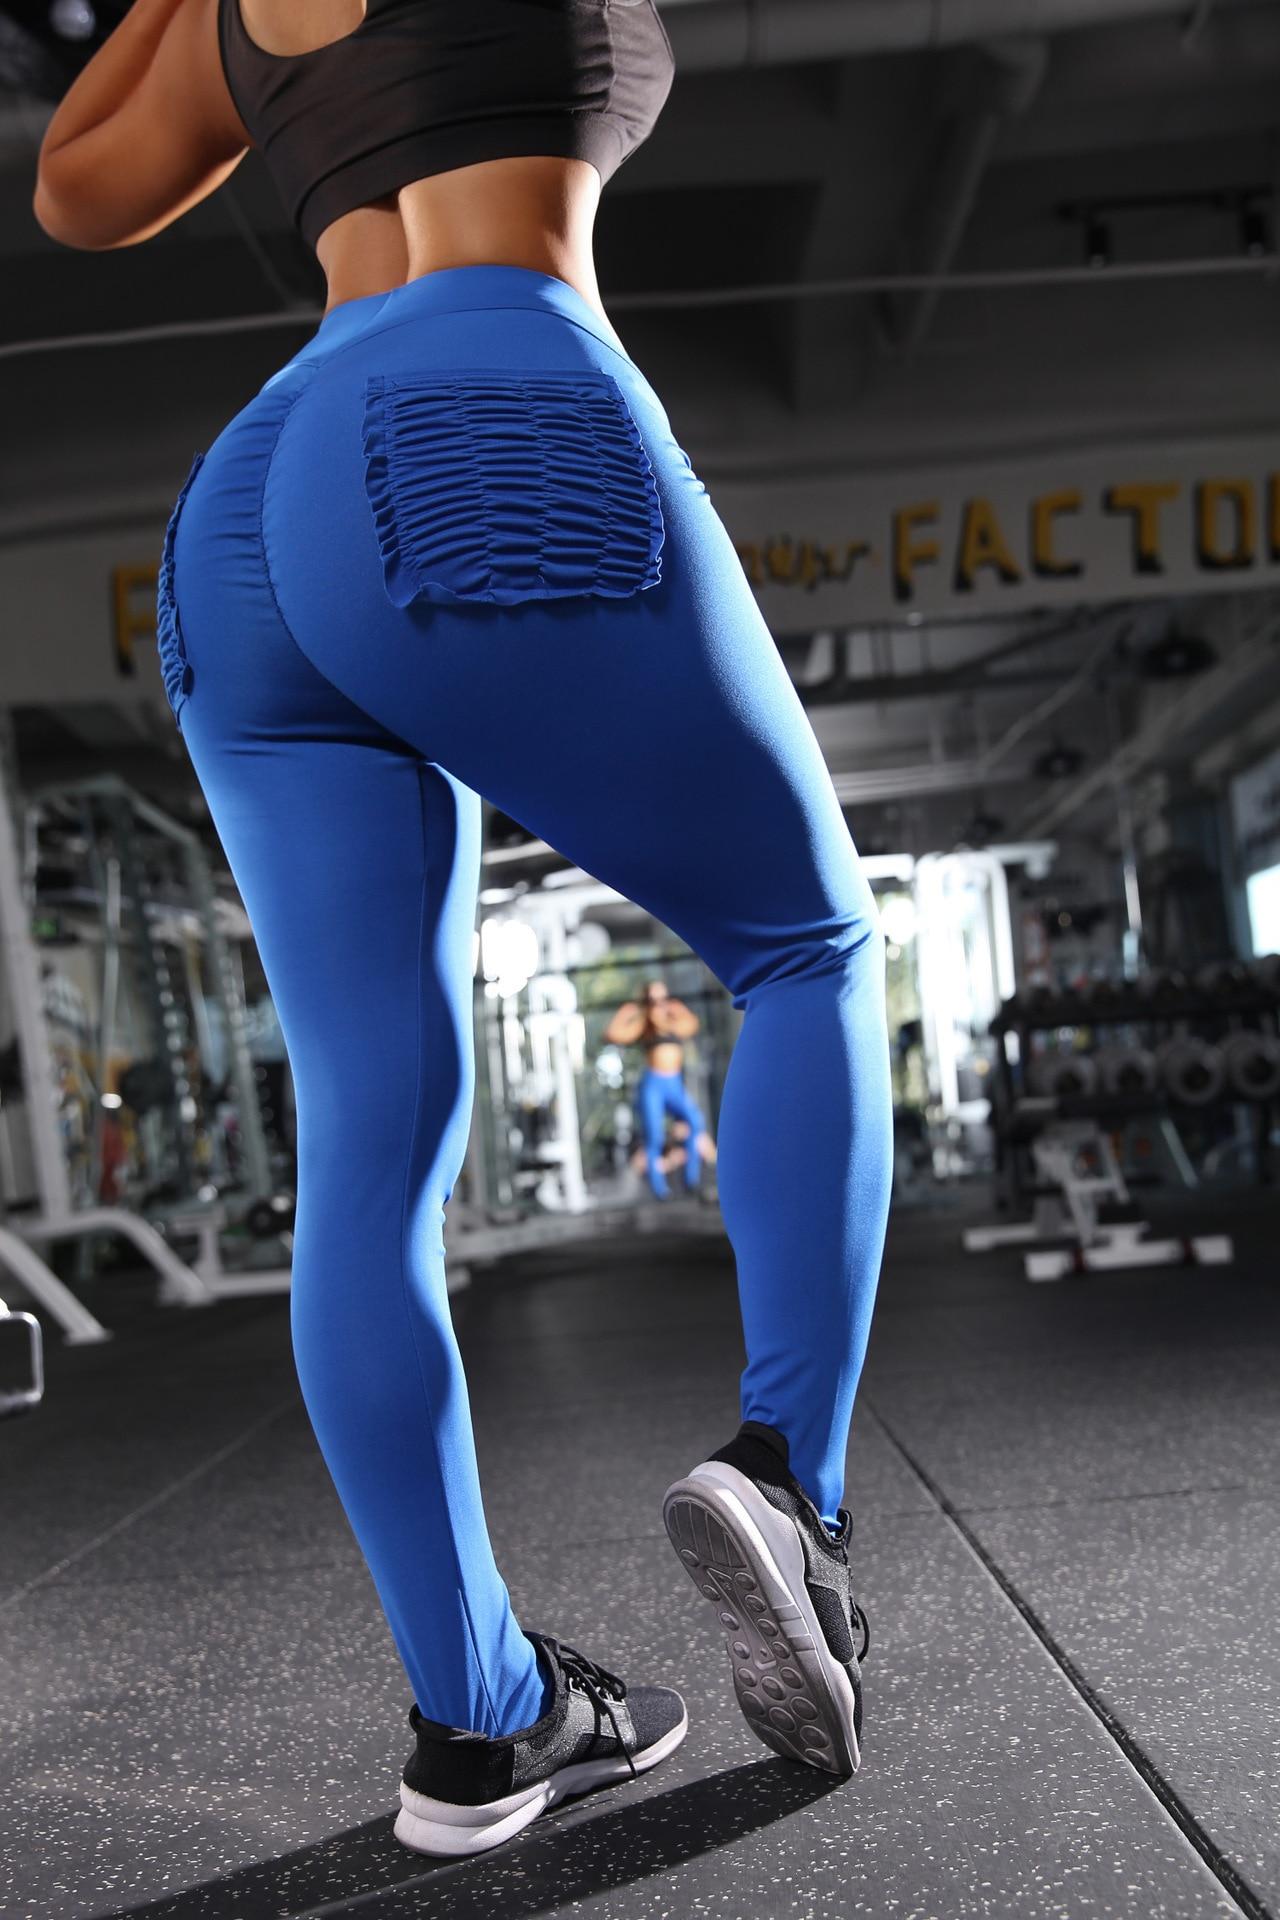 2019 Ankle Length Pants Elasticity Keep Slim Push Up Fitness Female Legging With Fashion Pockets Pantalon Taille Haute Femme Ez Leggings Aliexpress